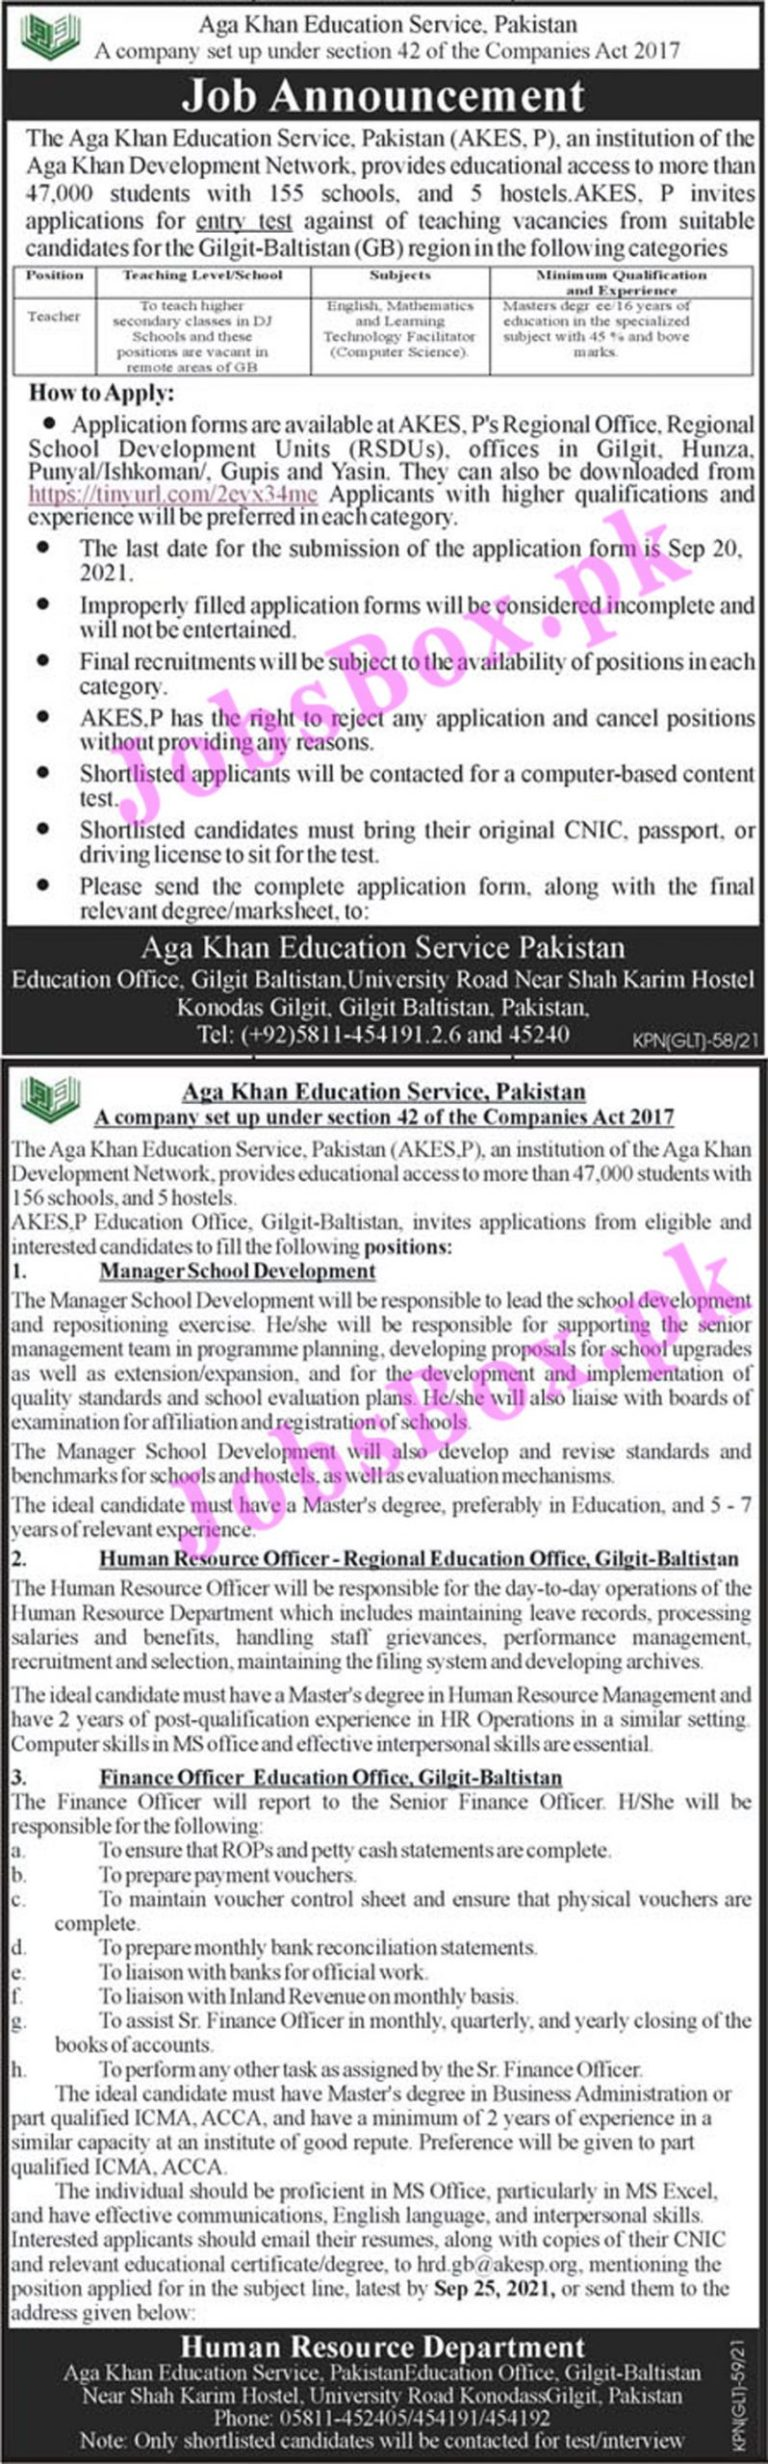 hrd.gb@akesp.org - Aga Khan Education Service Gilgit Baltistan Jobs 2021 in Pakistan